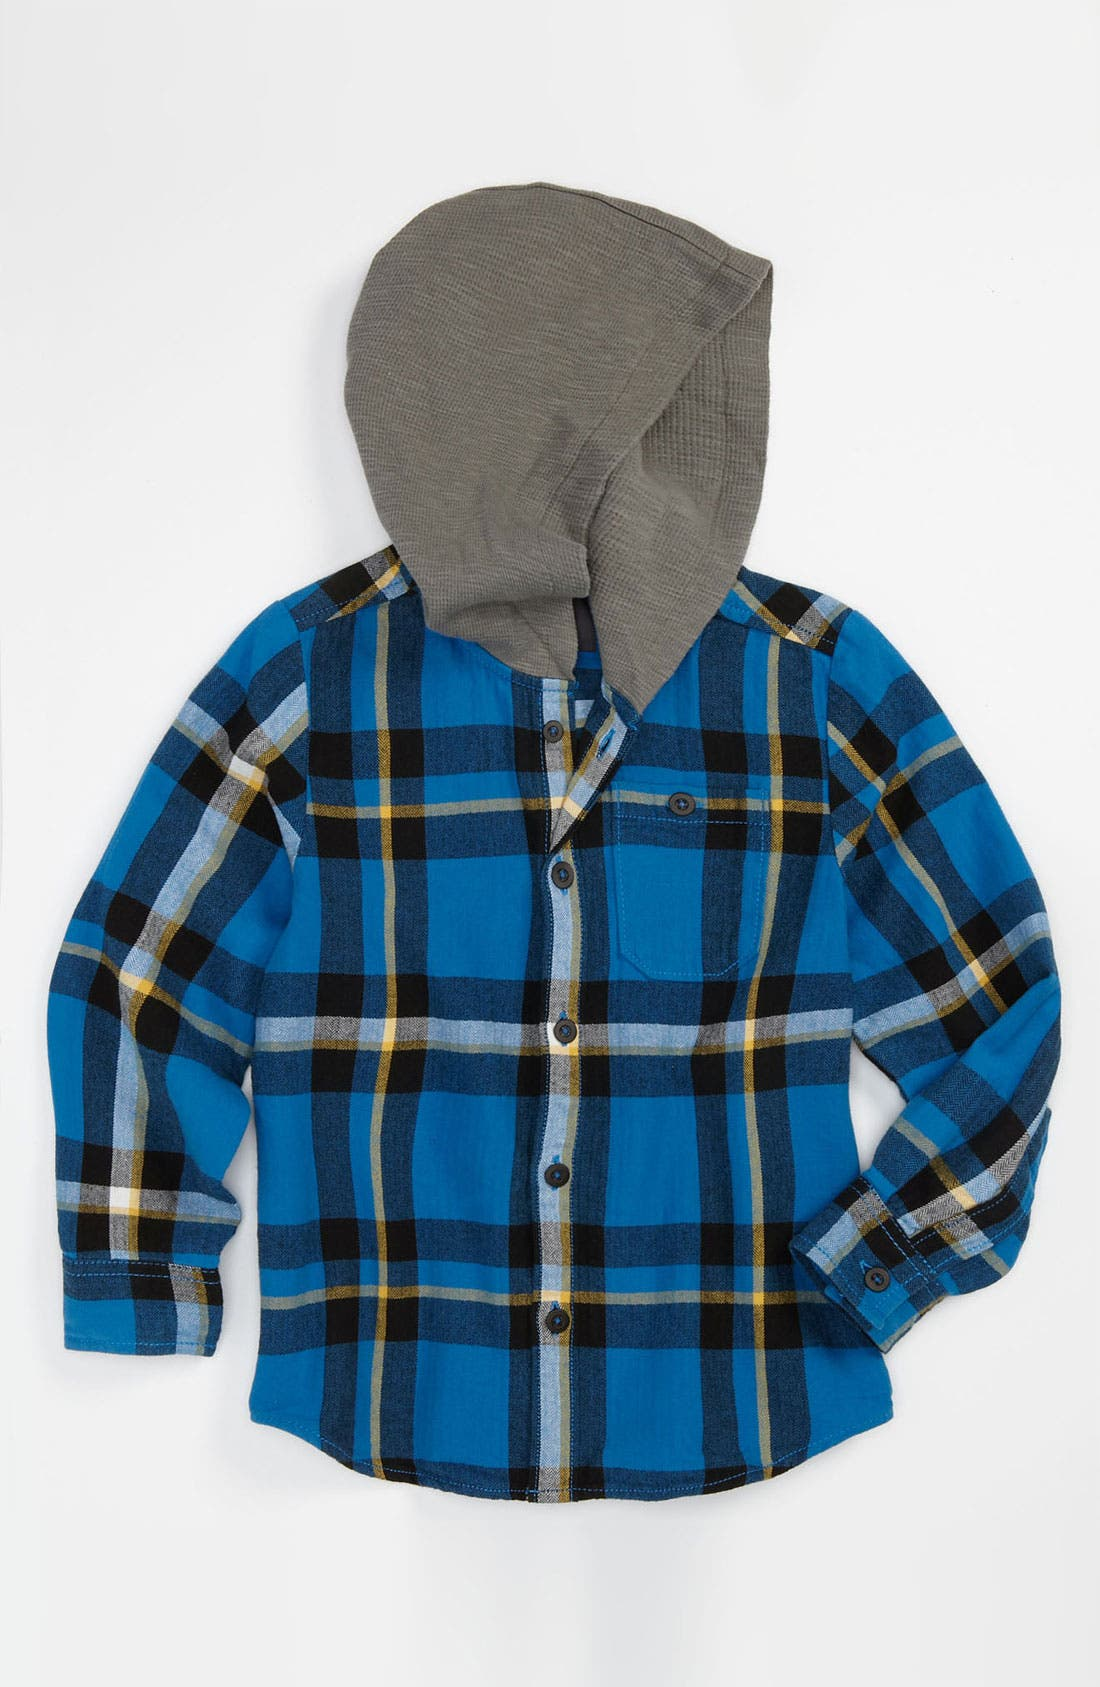 Alternate Image 1 Selected - Pure Stuff 'Hunter' Woven Shirt (Toddler)